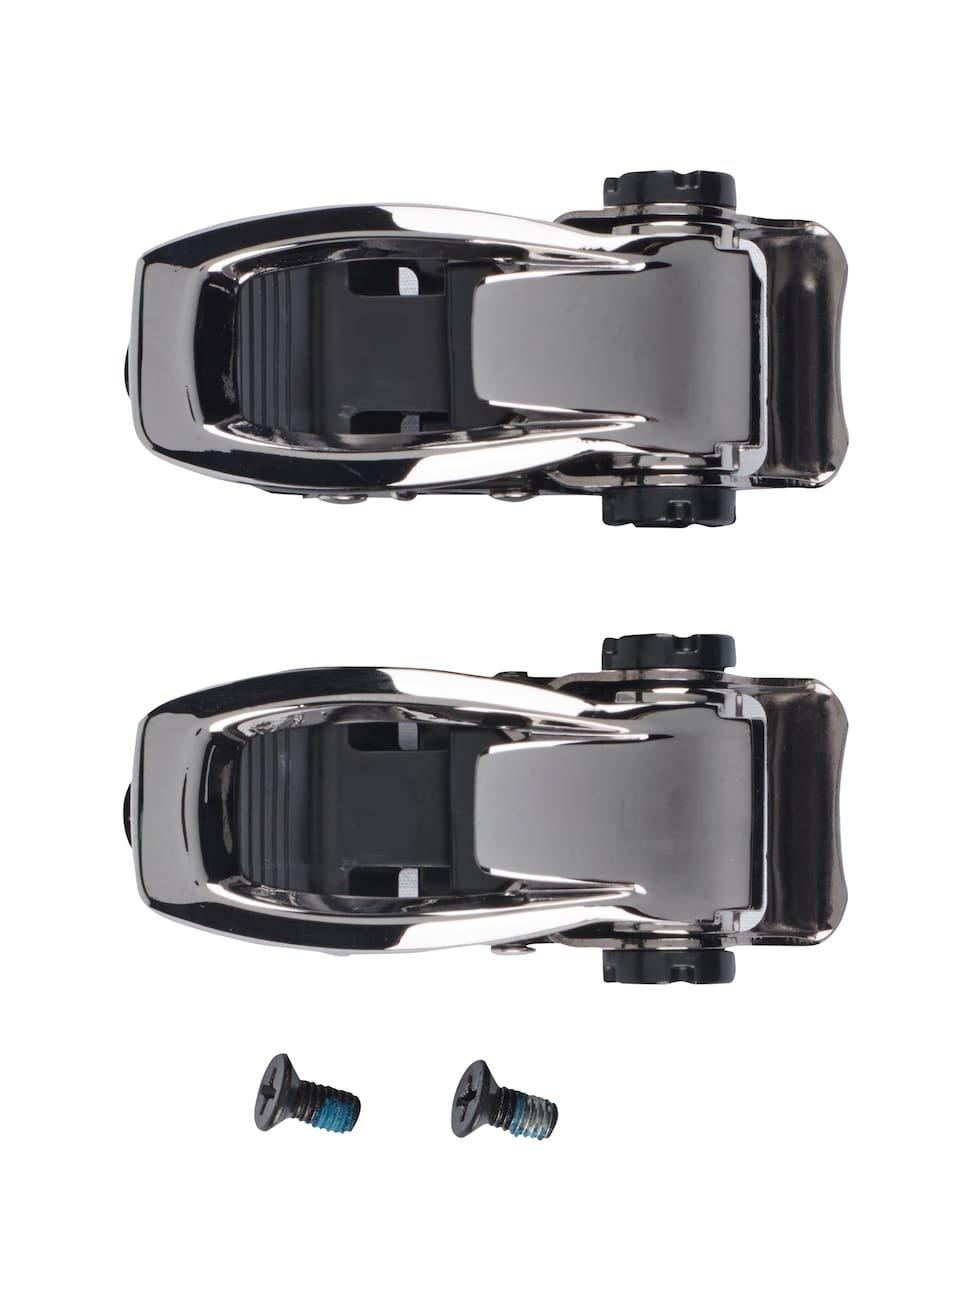 Burton Toe Buckle Replacement Black  - pair